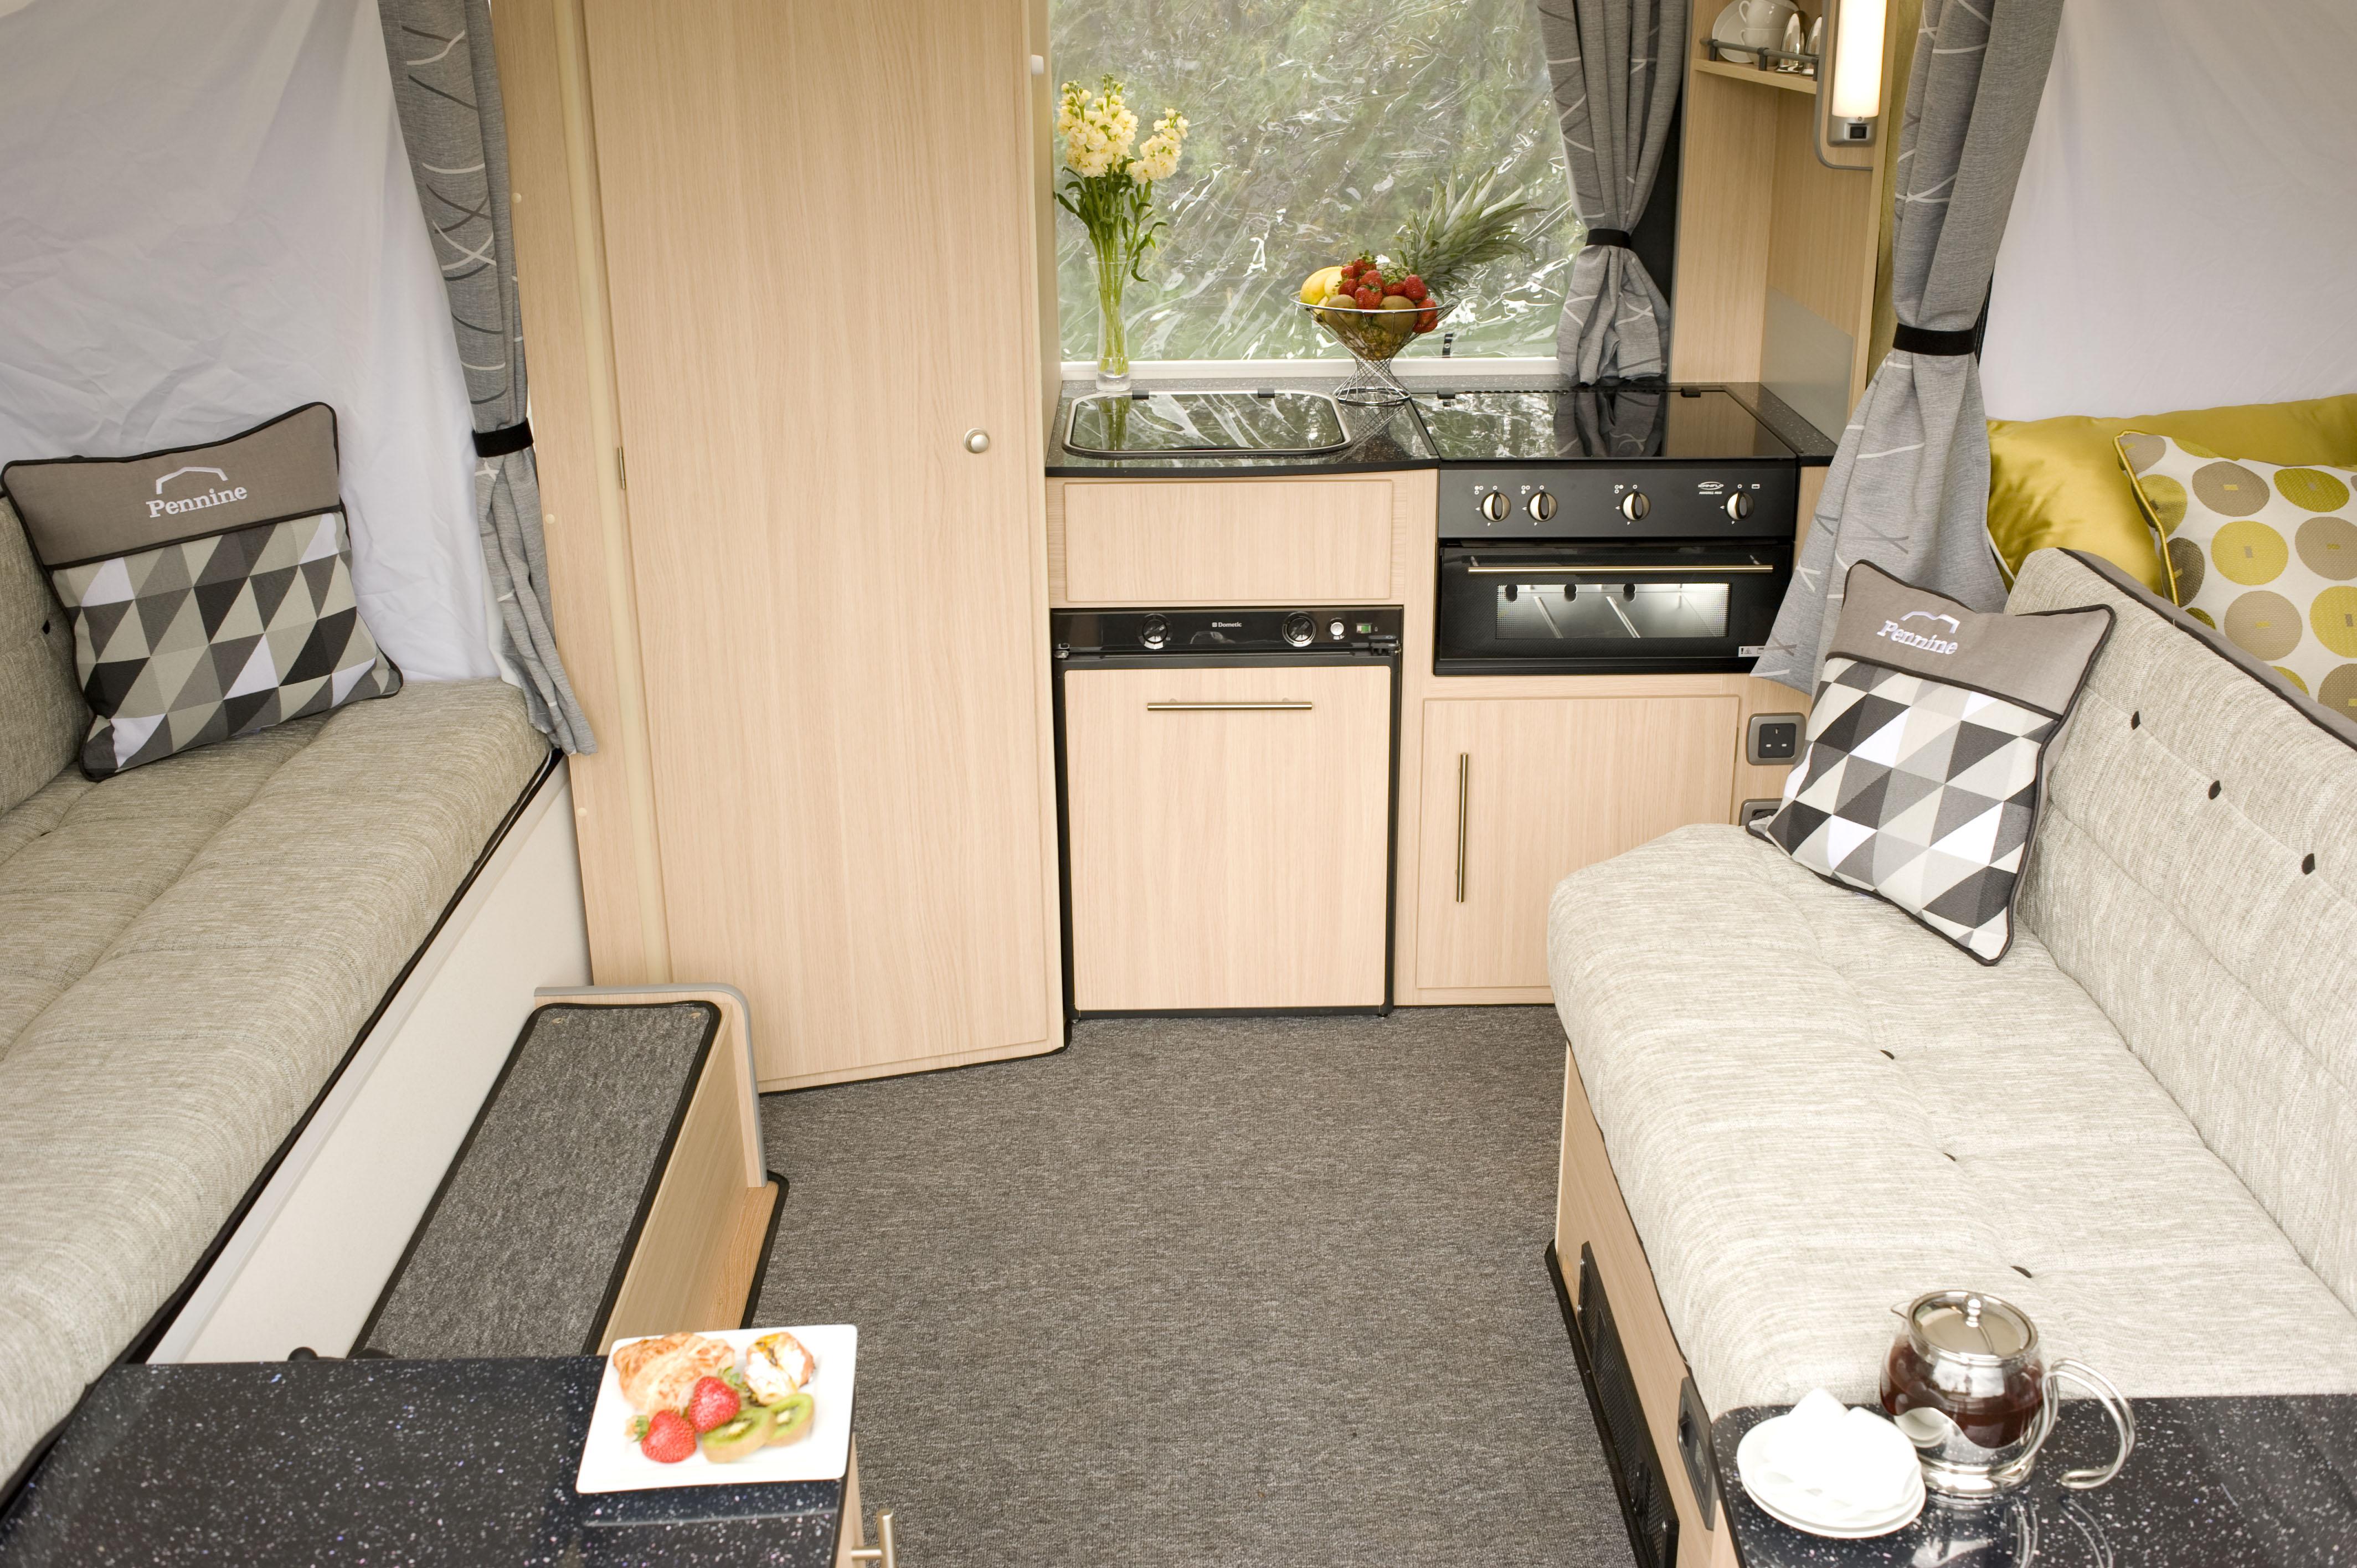 pennine trailer tent dimensions